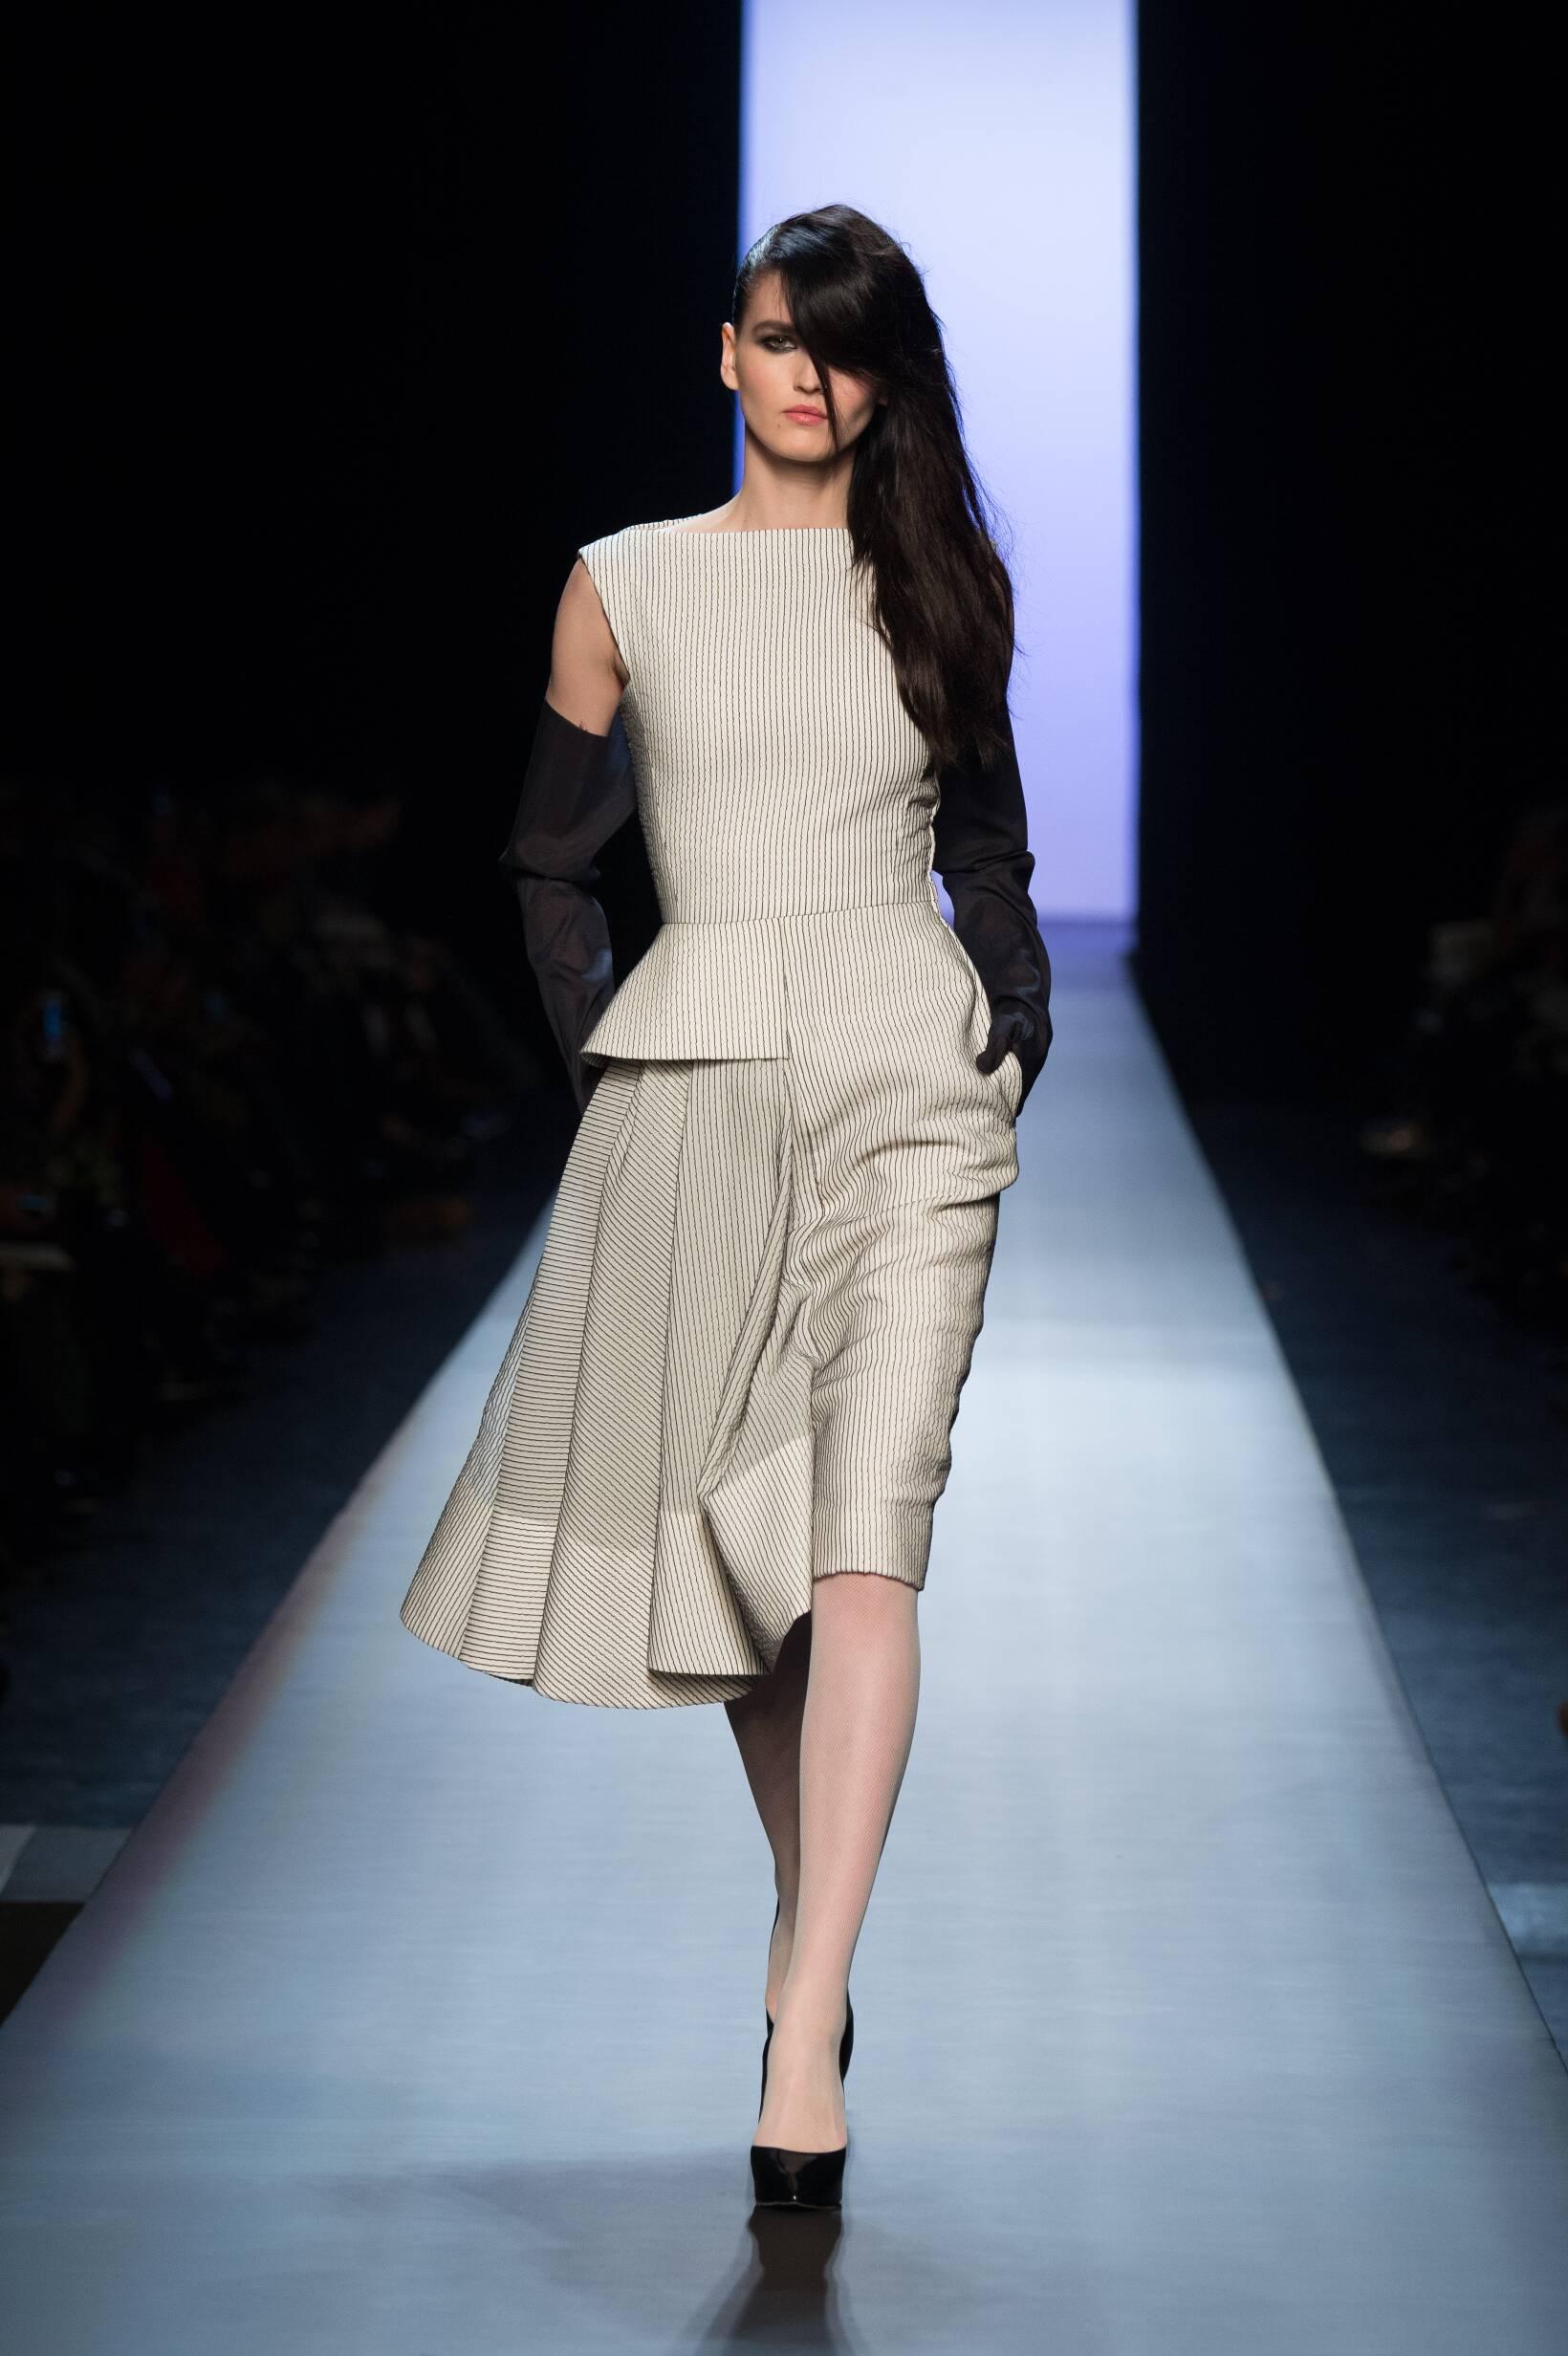 Jean Paul Gaultier Haute Couture Collection Paris Fashion Week Womenswear